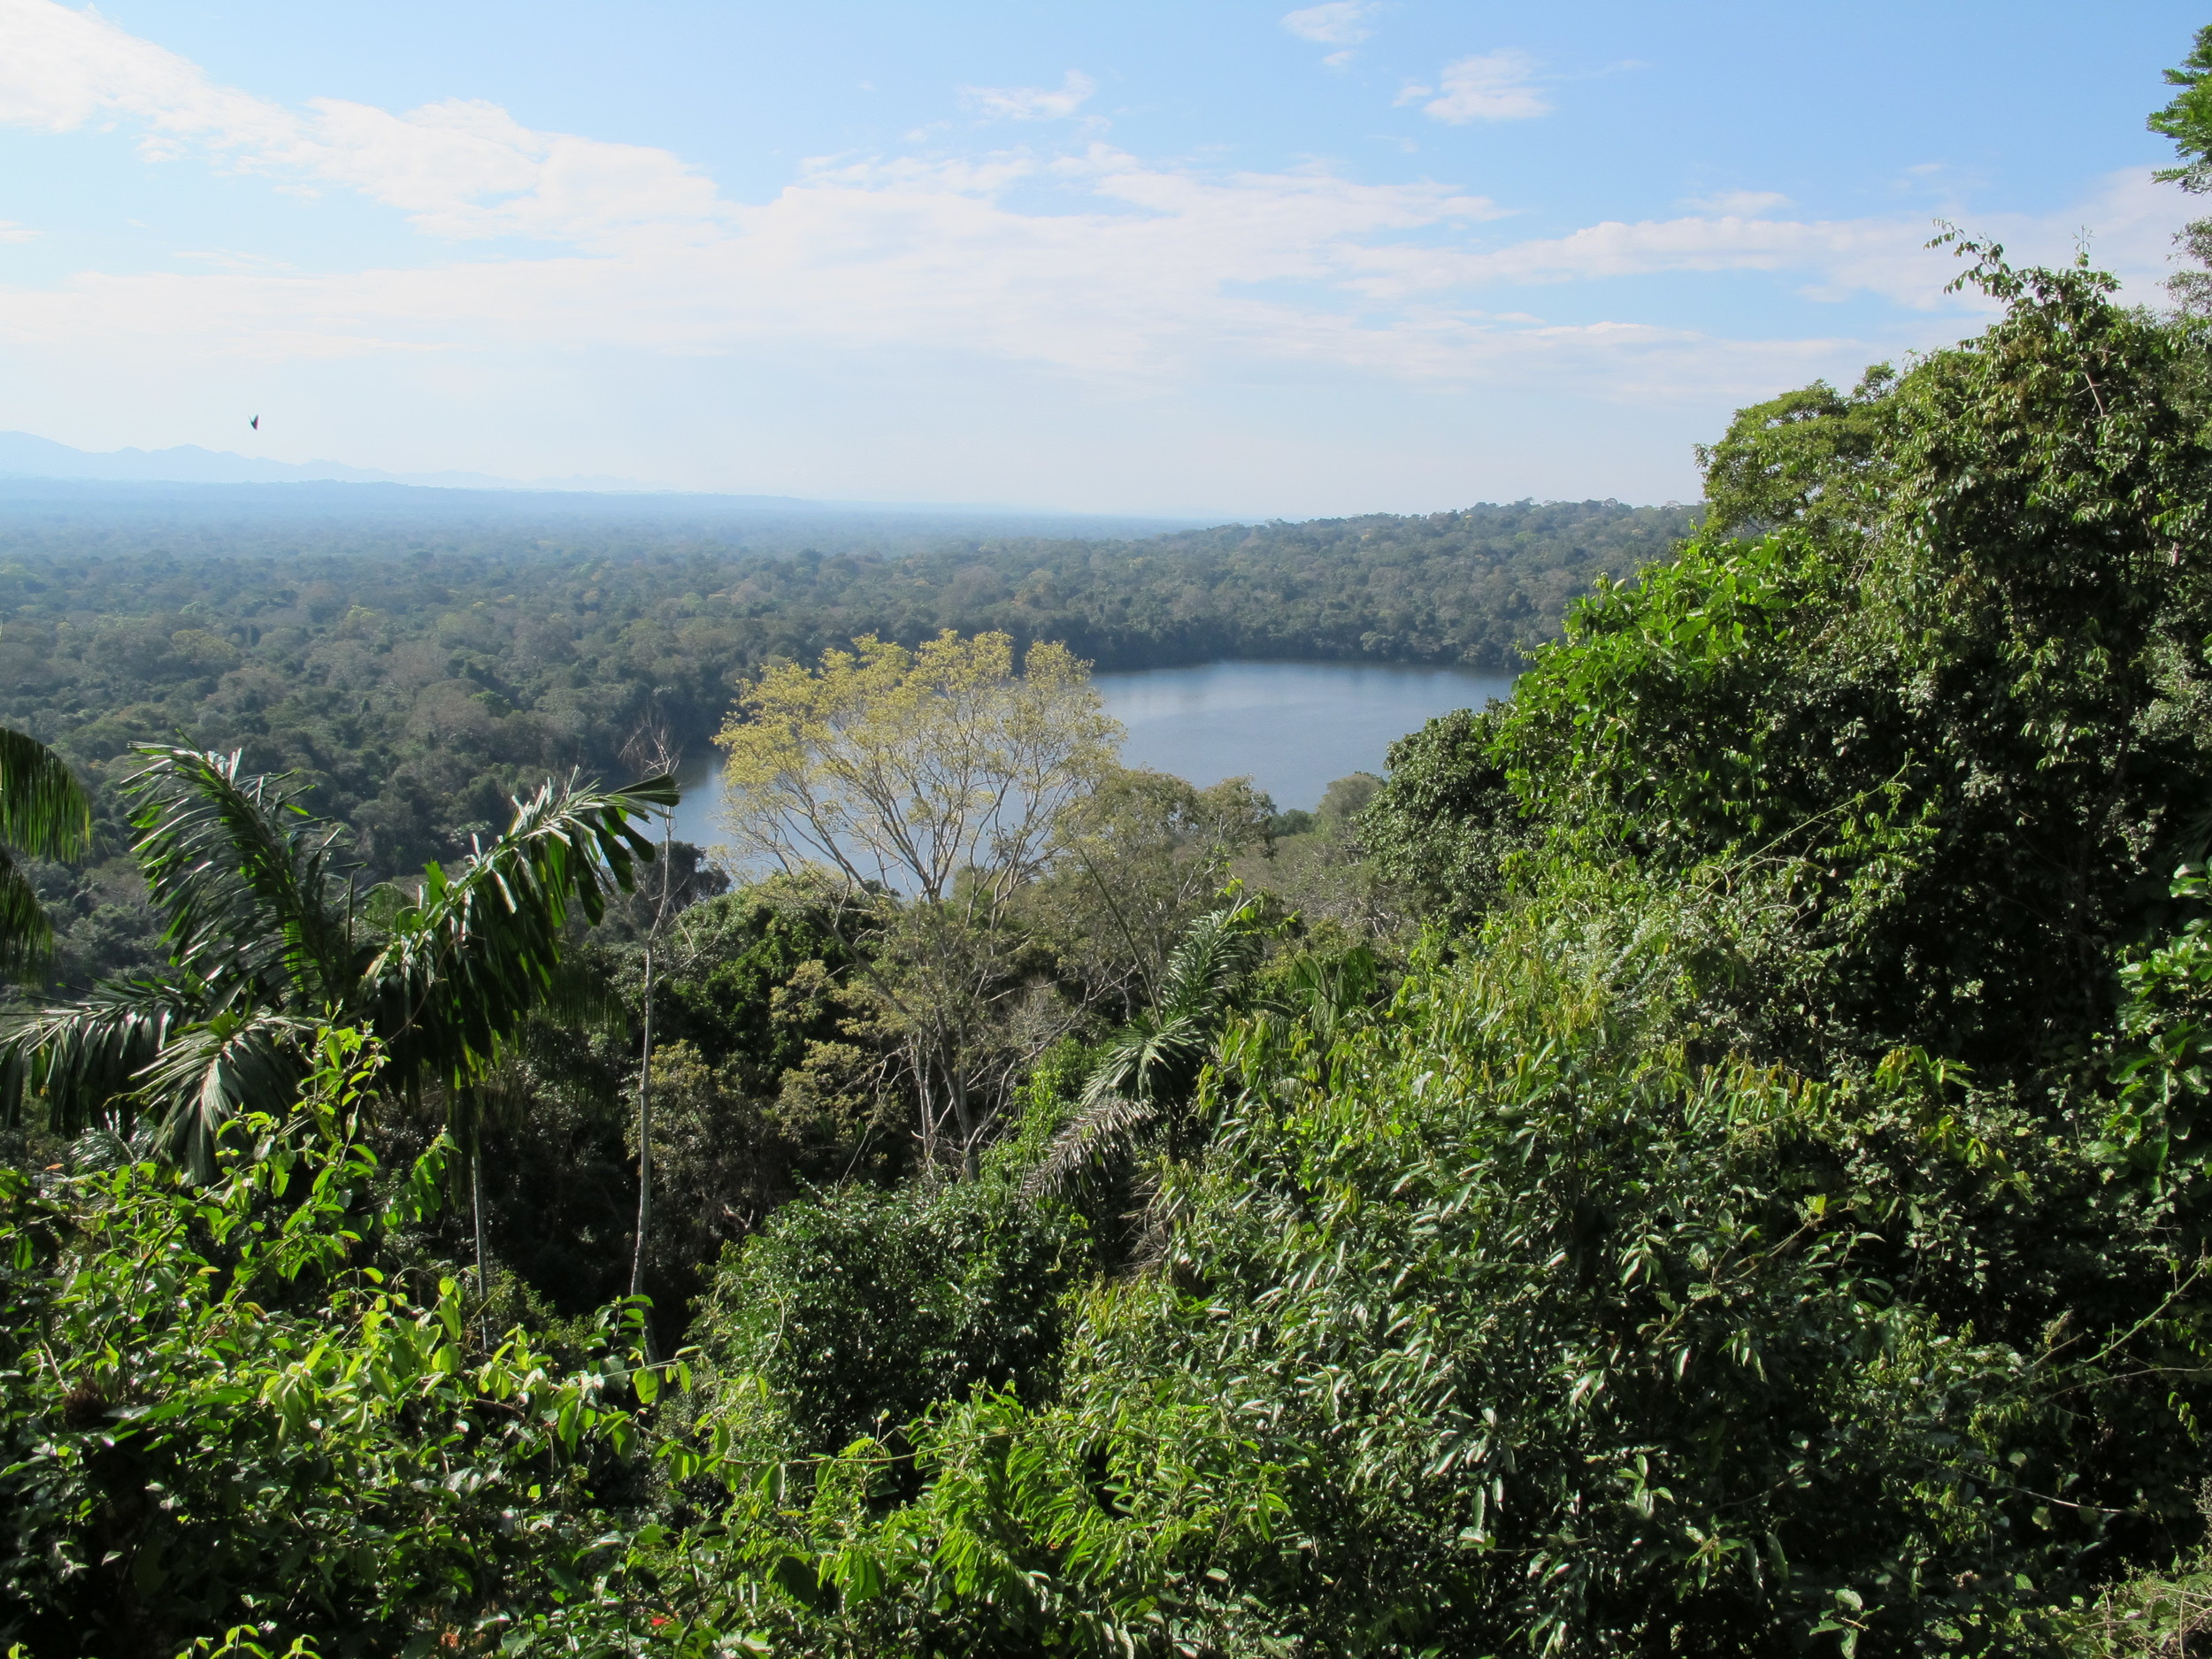 Tree Canopy overlooking the reflective lake, Bolivian Amazon